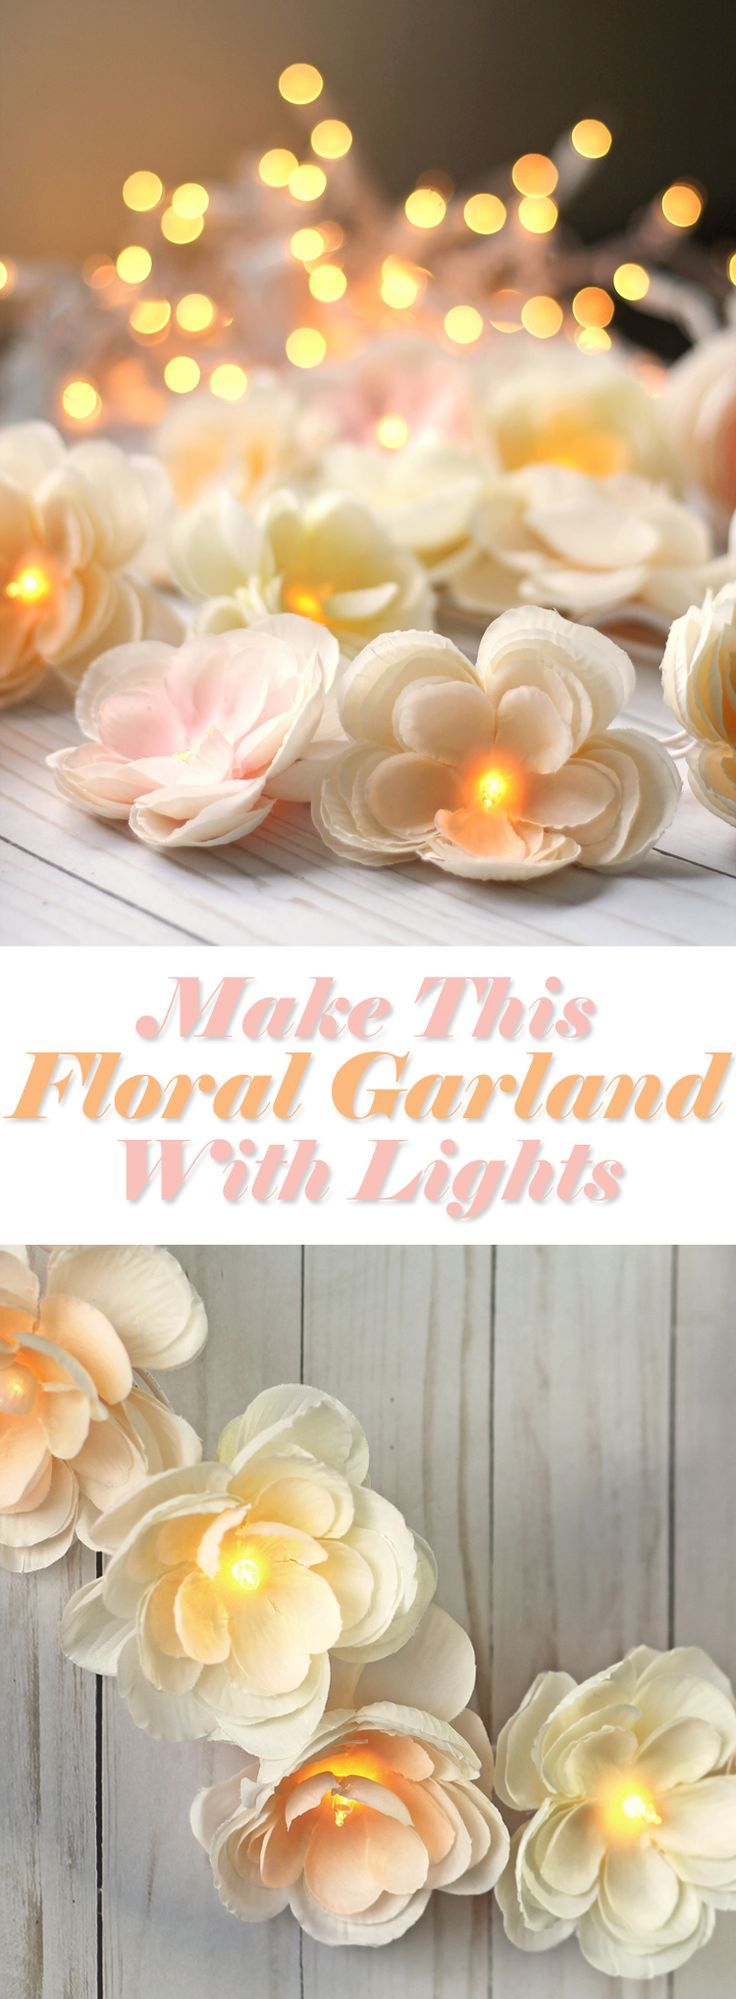 DIY Floral Garland With Lights – sandra.mdsp .E